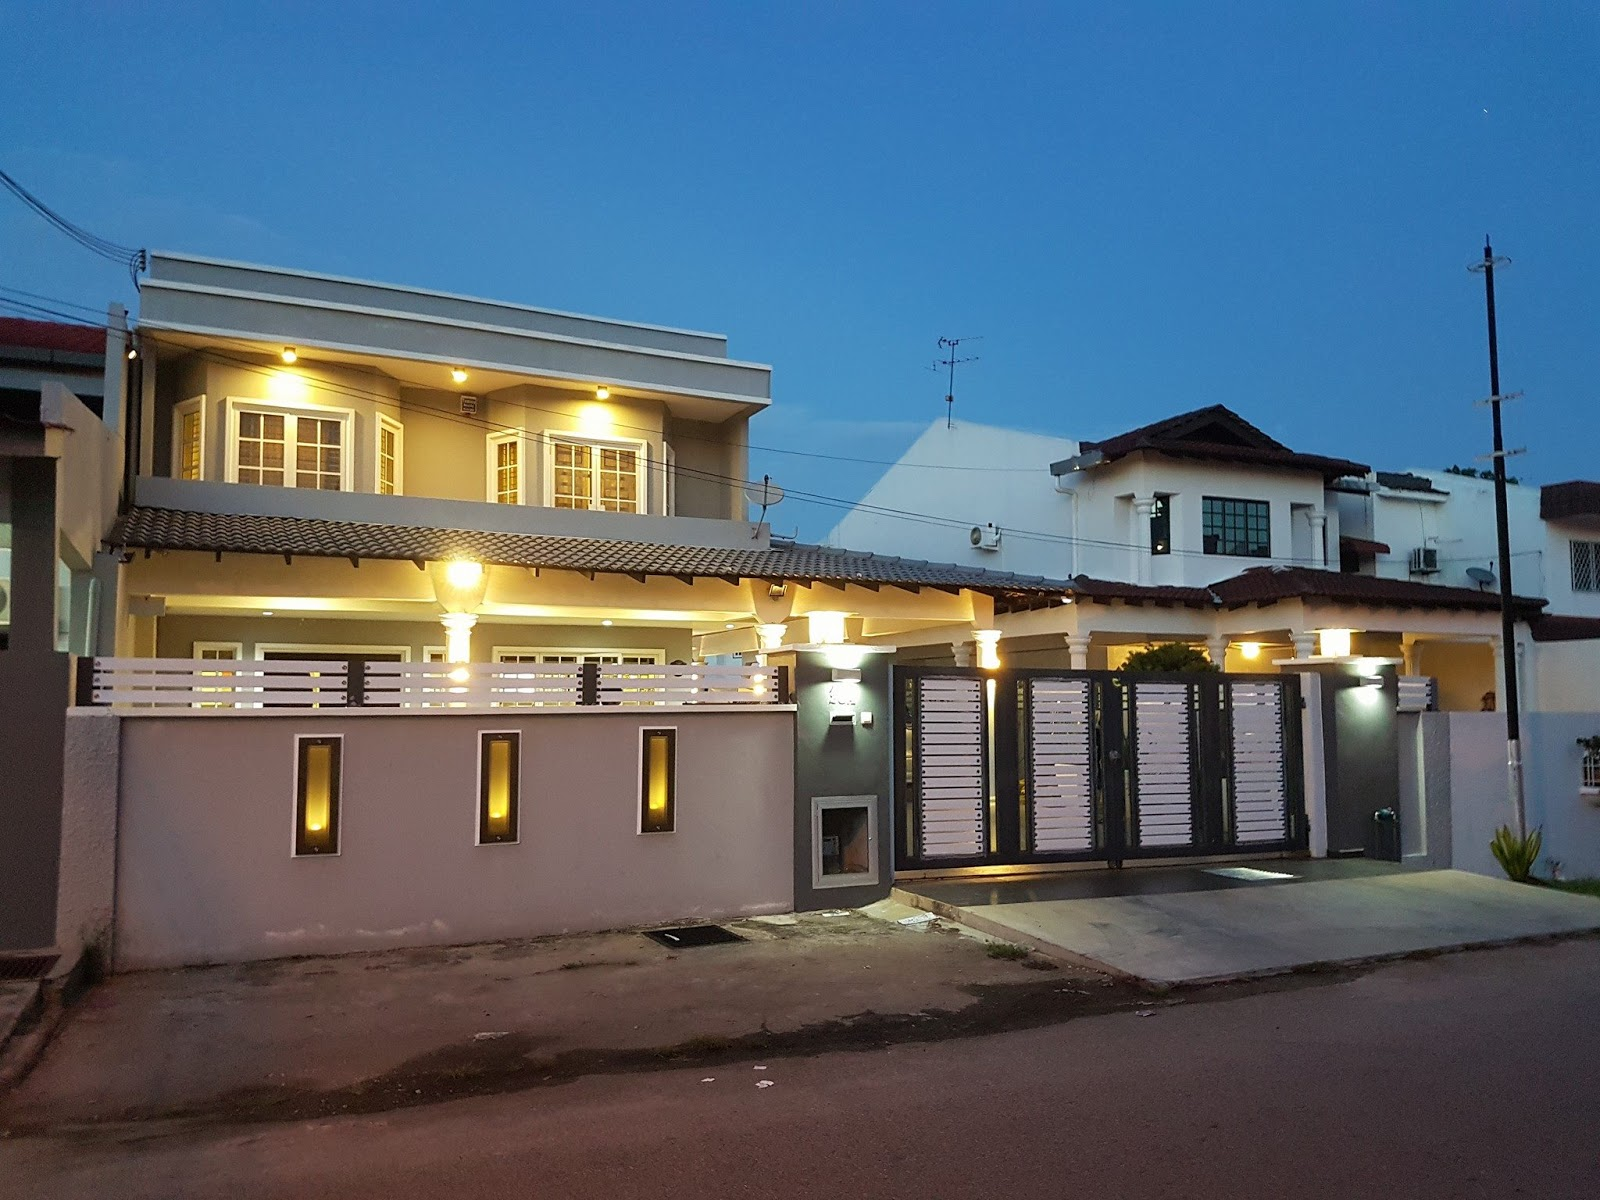 PROMO] 59% OFF Melaka Homestay 15min To Town 100mbps Free Wifi Jalan